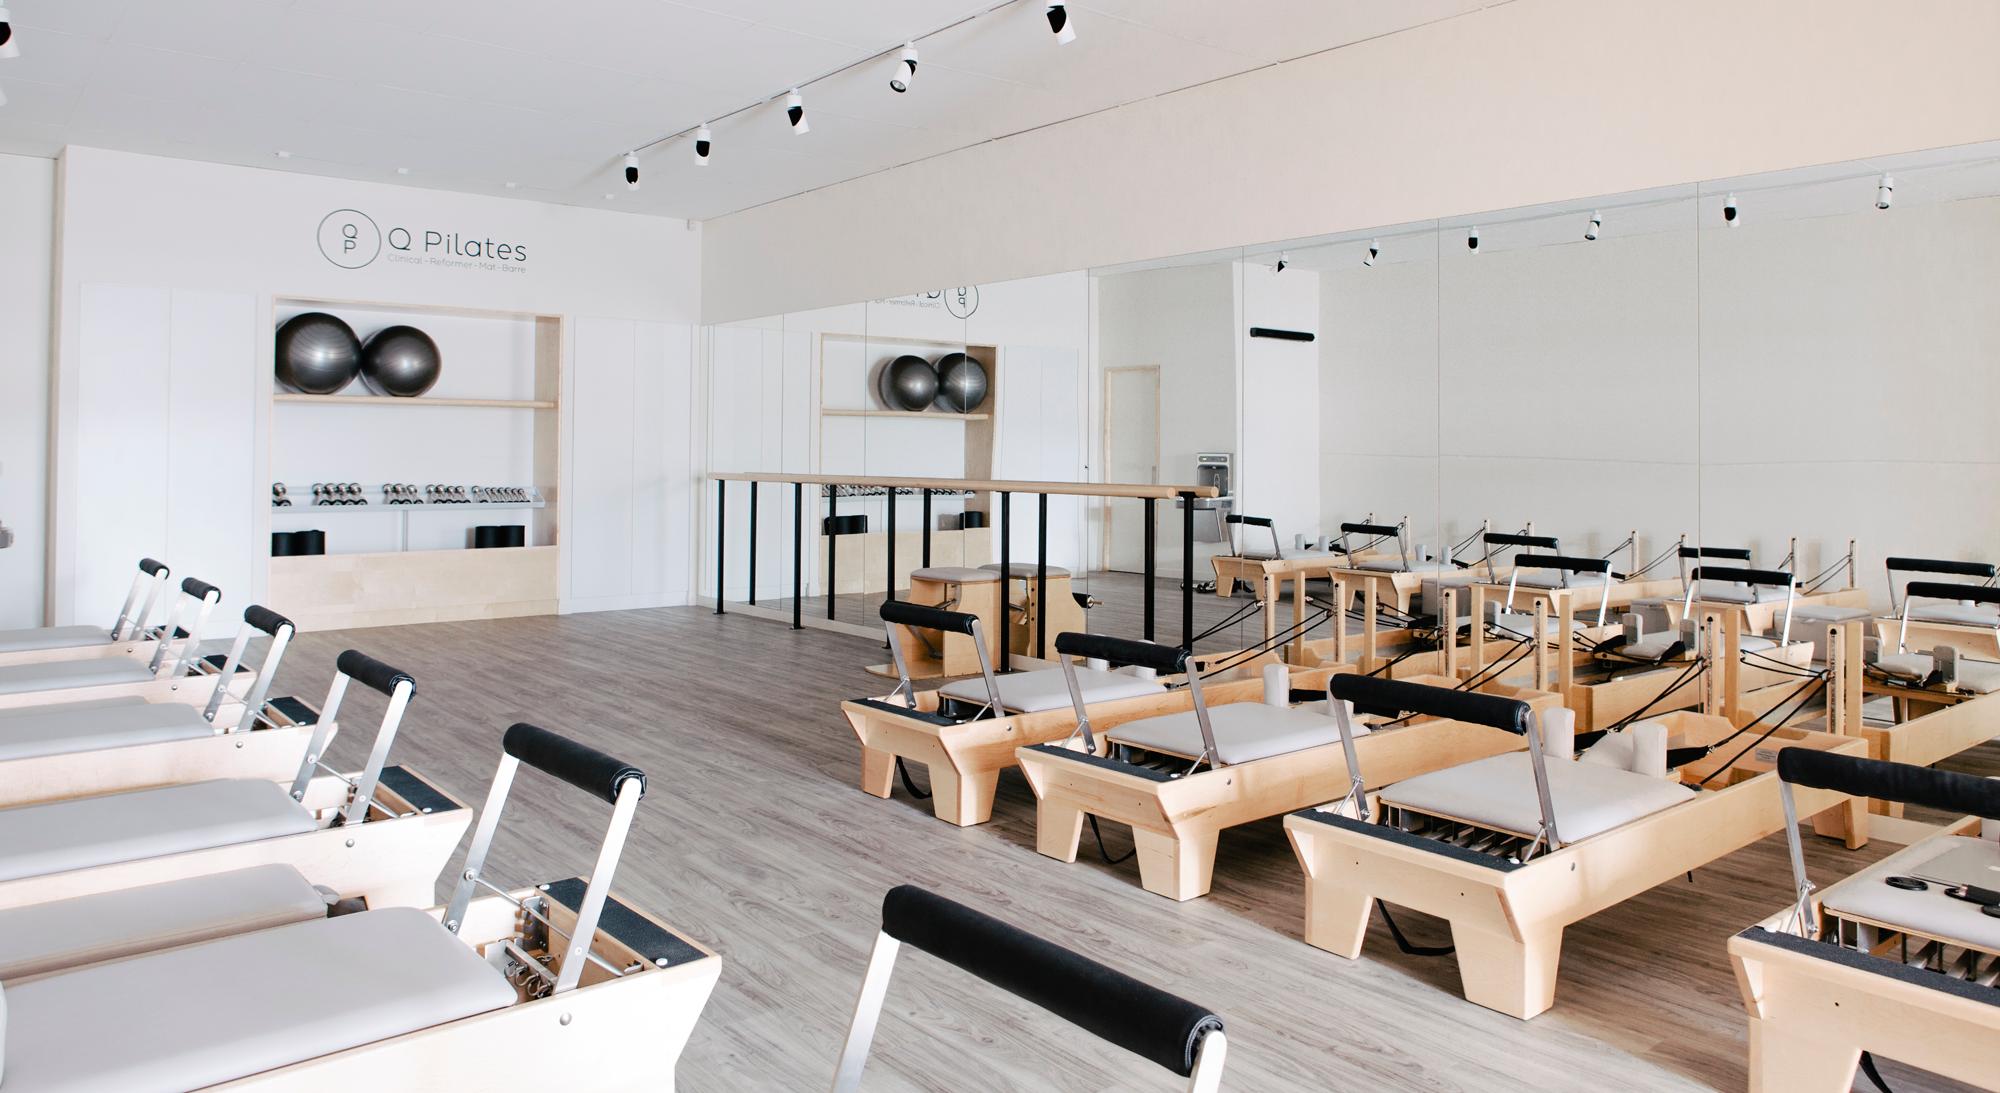 I like the room dividers Interior Design Pilates Studio | Marilena Rizou |  Projects | Mind & Body | Image 7 | Gym | Pinterest | Pilates studio, Body  images ...